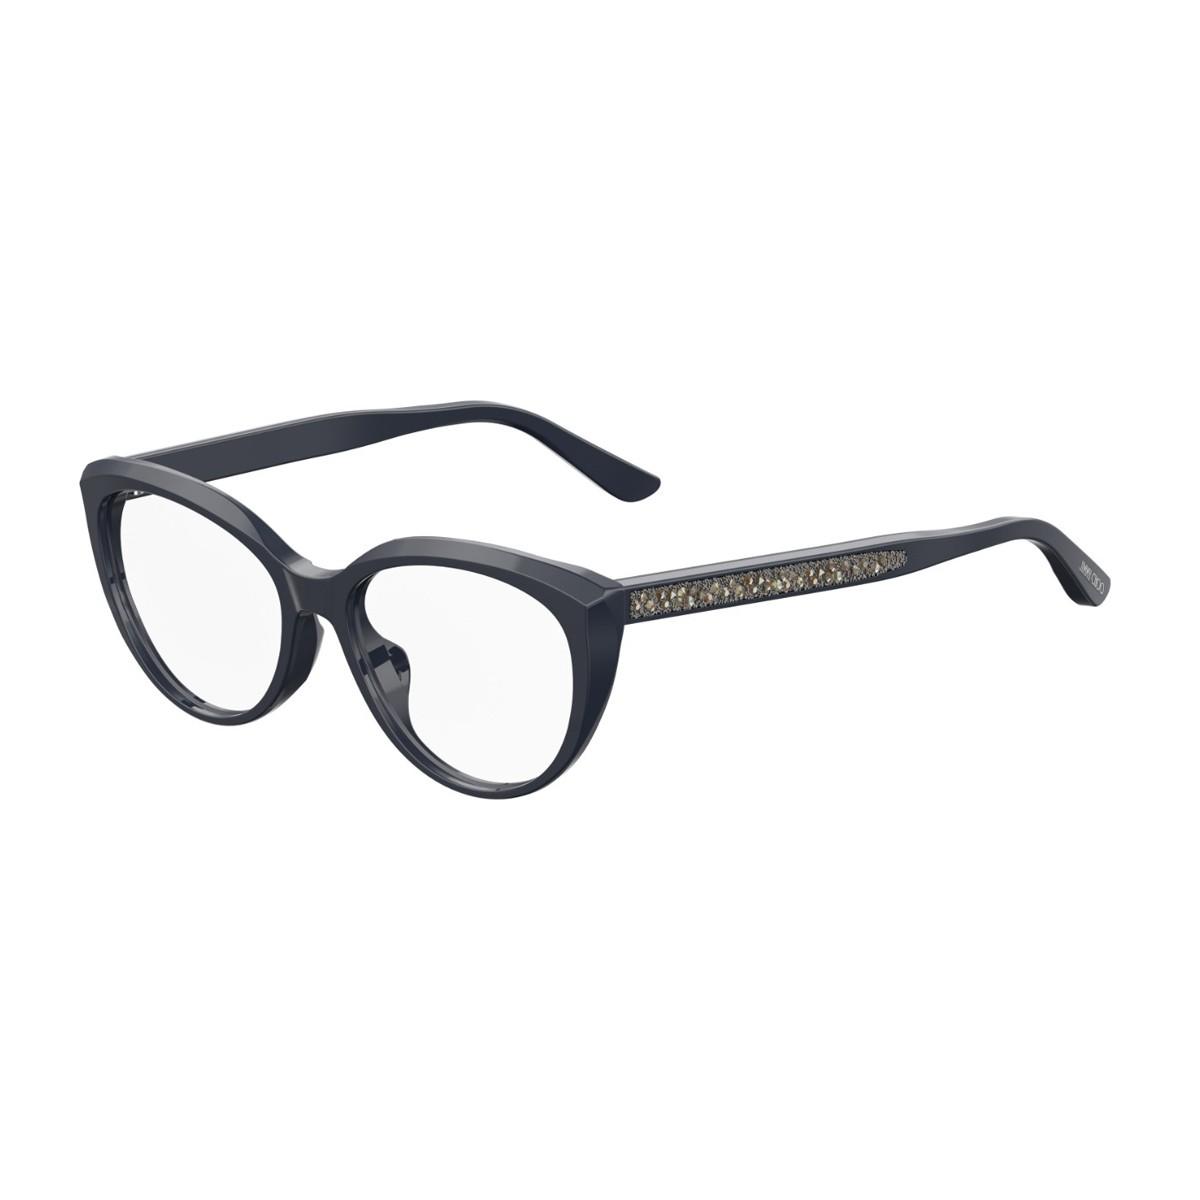 Jimmy Choo Jc233/f | Women's eyeglasses